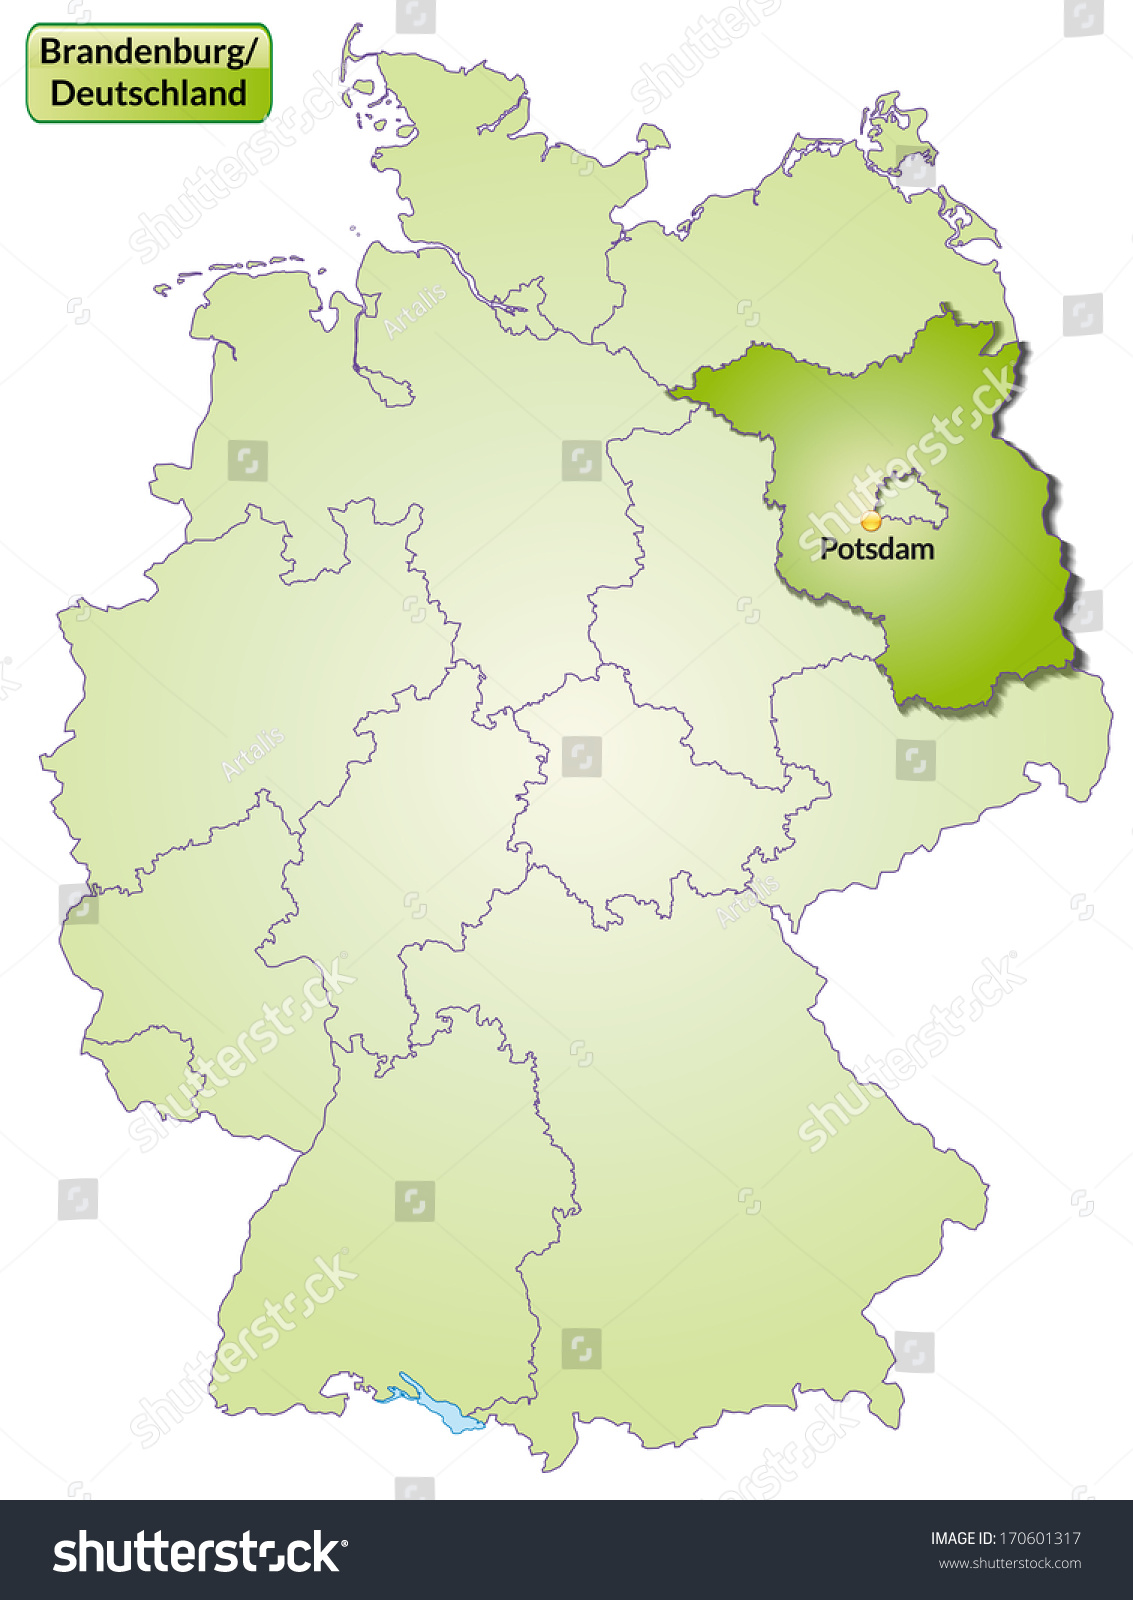 Map Brandenburg Main Cities Green Stock Illustration 170601317